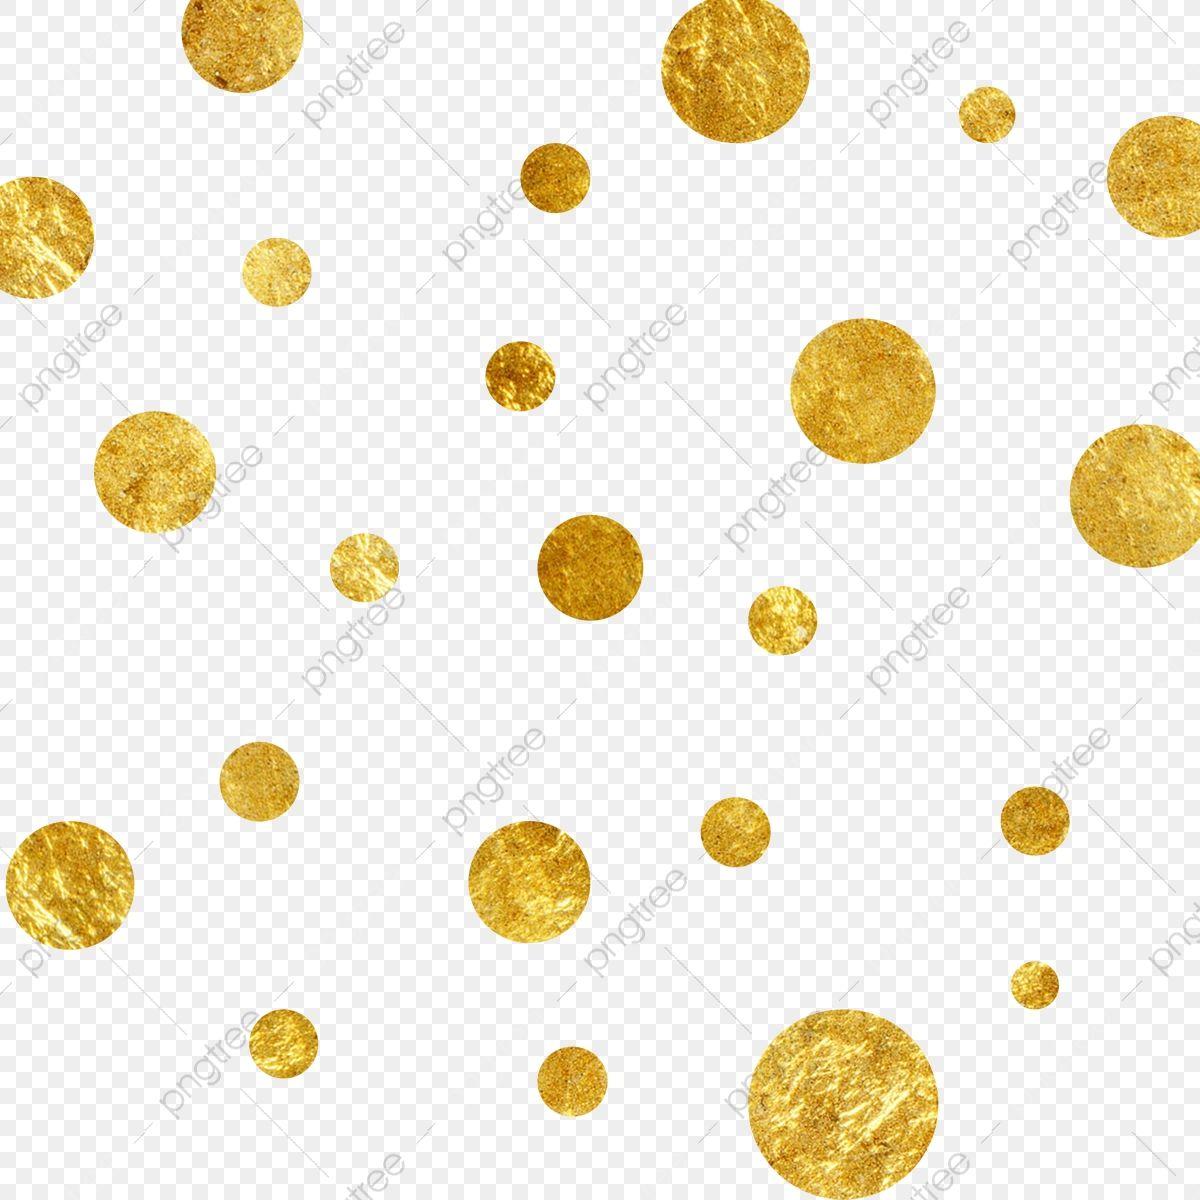 Floating Golden Dots Golden Gold Foil Material Golden Dot Png Transparent Clipart Image And Psd File For Free Download Geometric Background Background Banner Floating Decorations